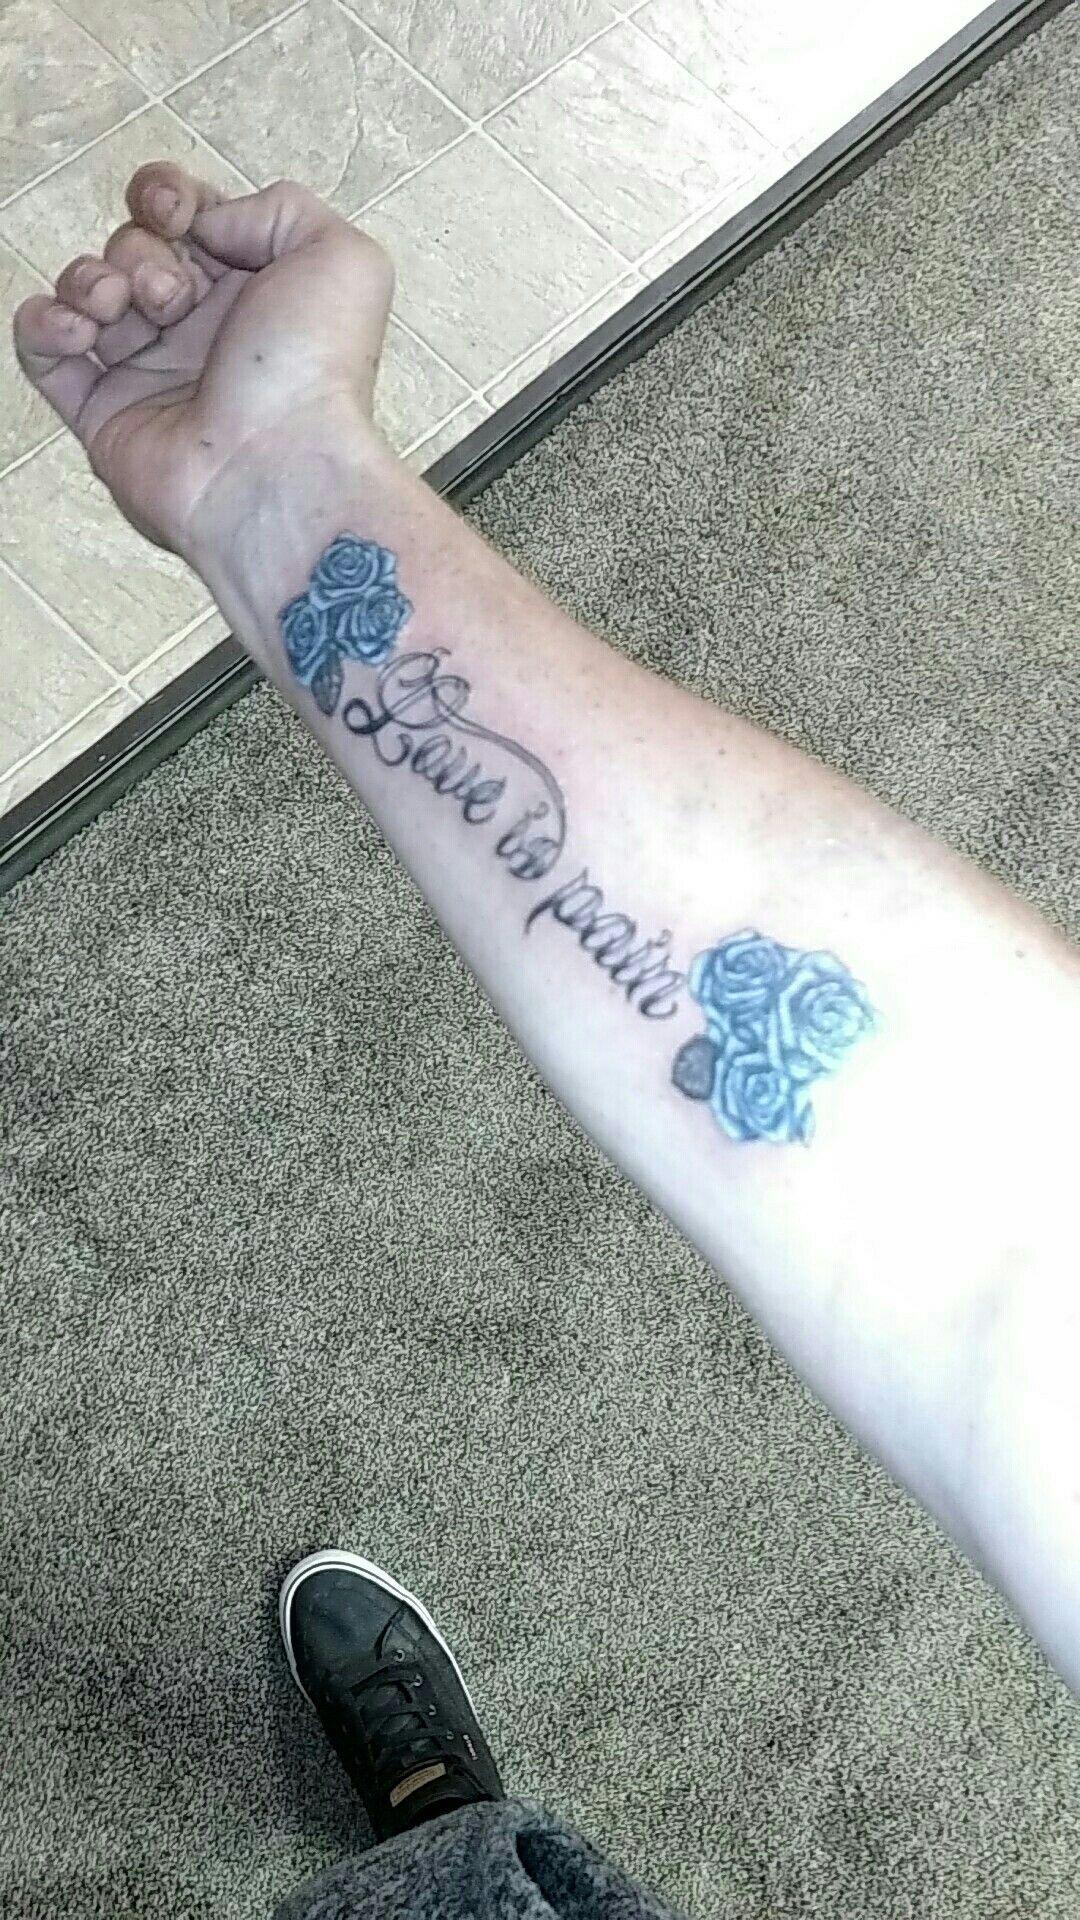 Pin by ethen bettles on my tats pinterest tatting